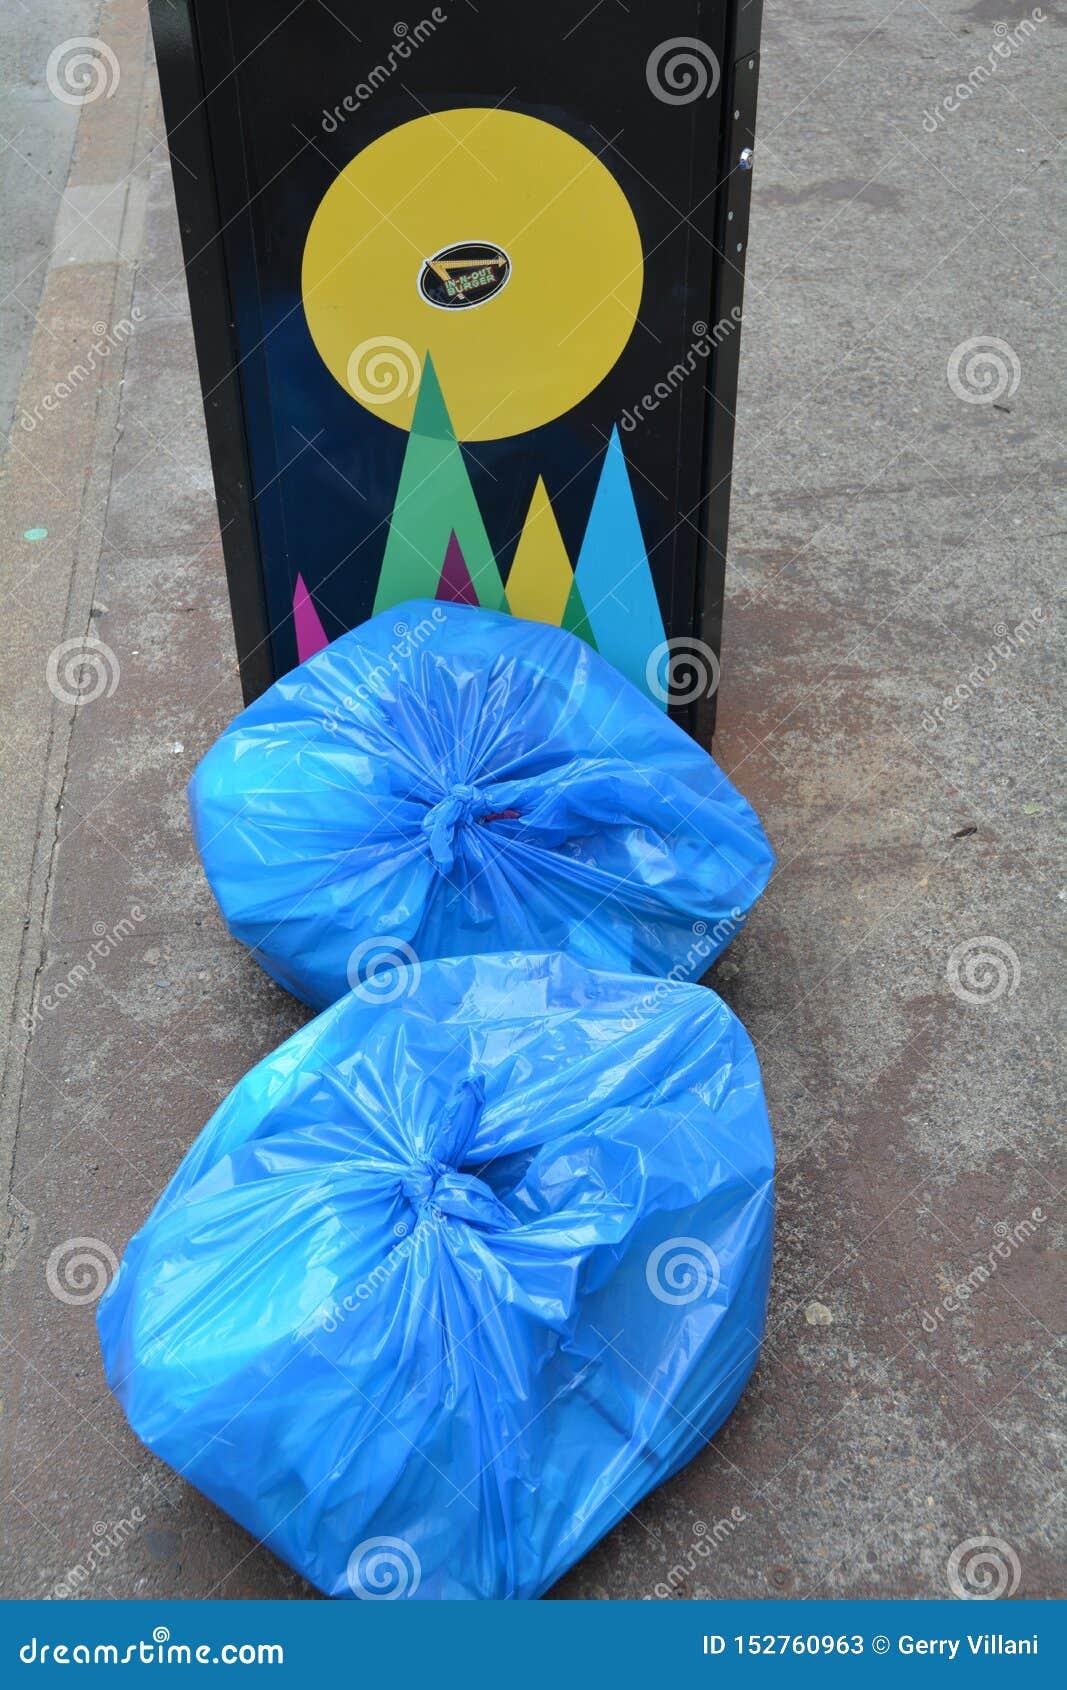 Two blue garbage bags in Portland, Oregon